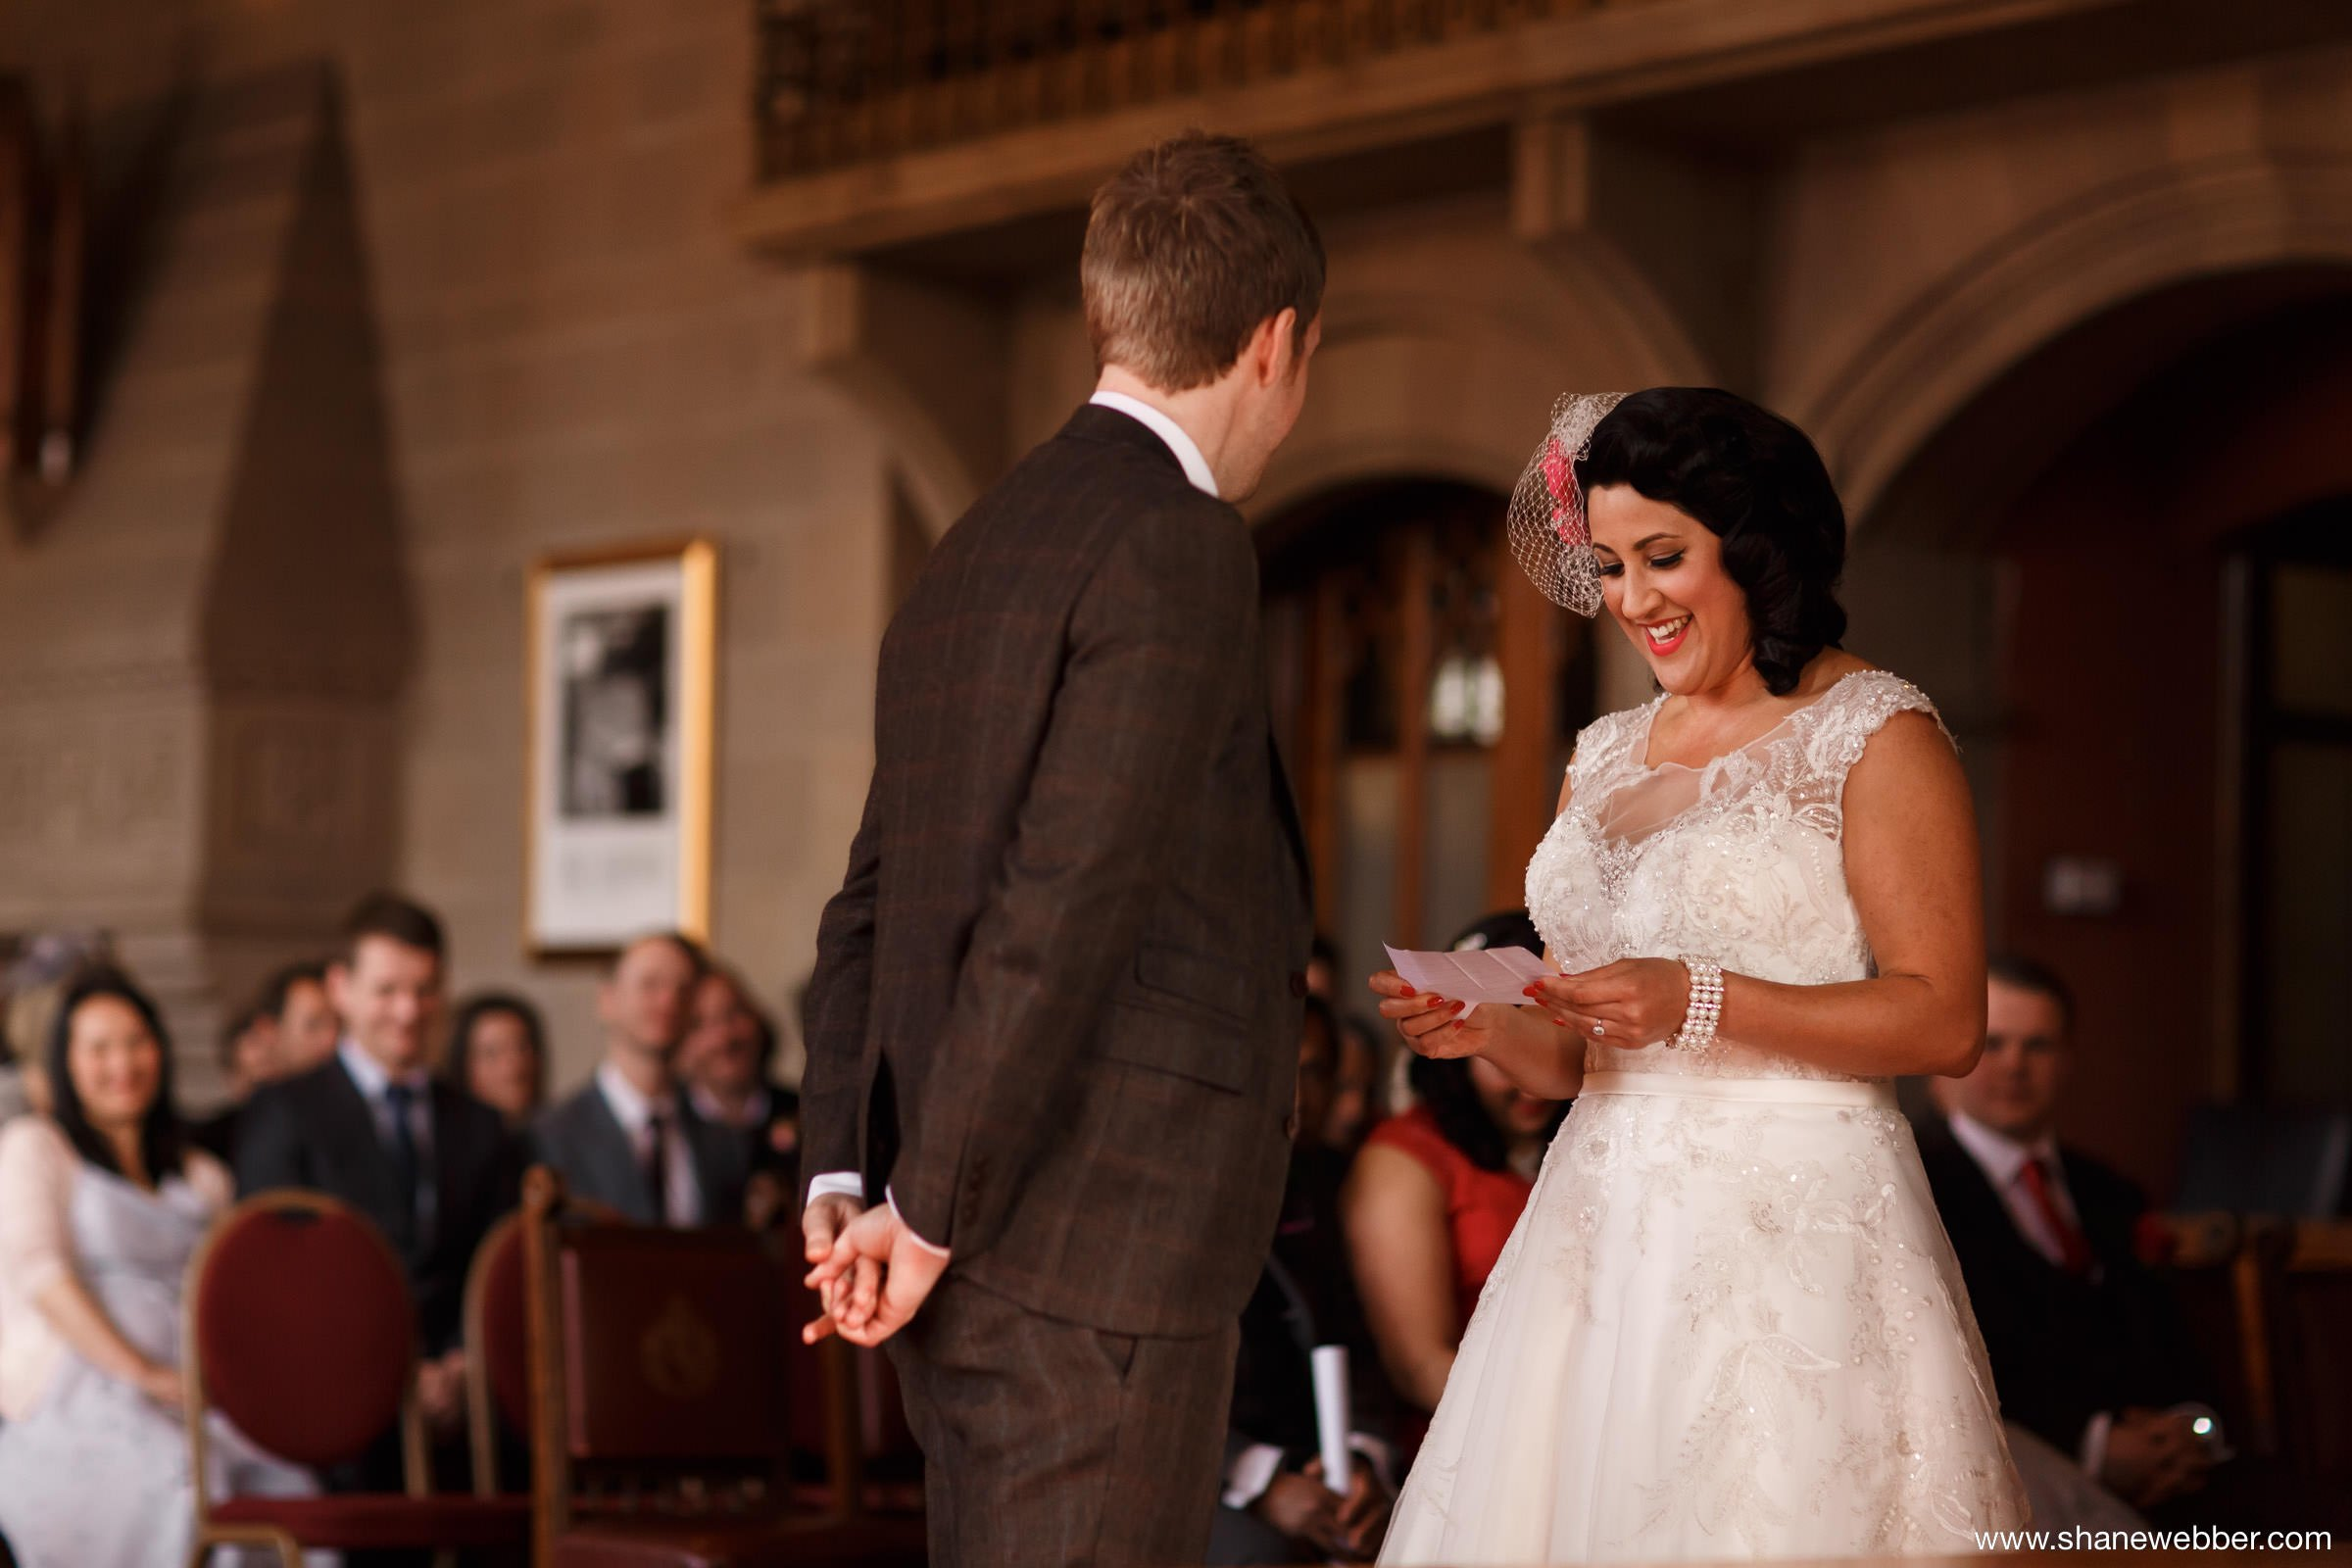 Manchester Town Hall wedding photos